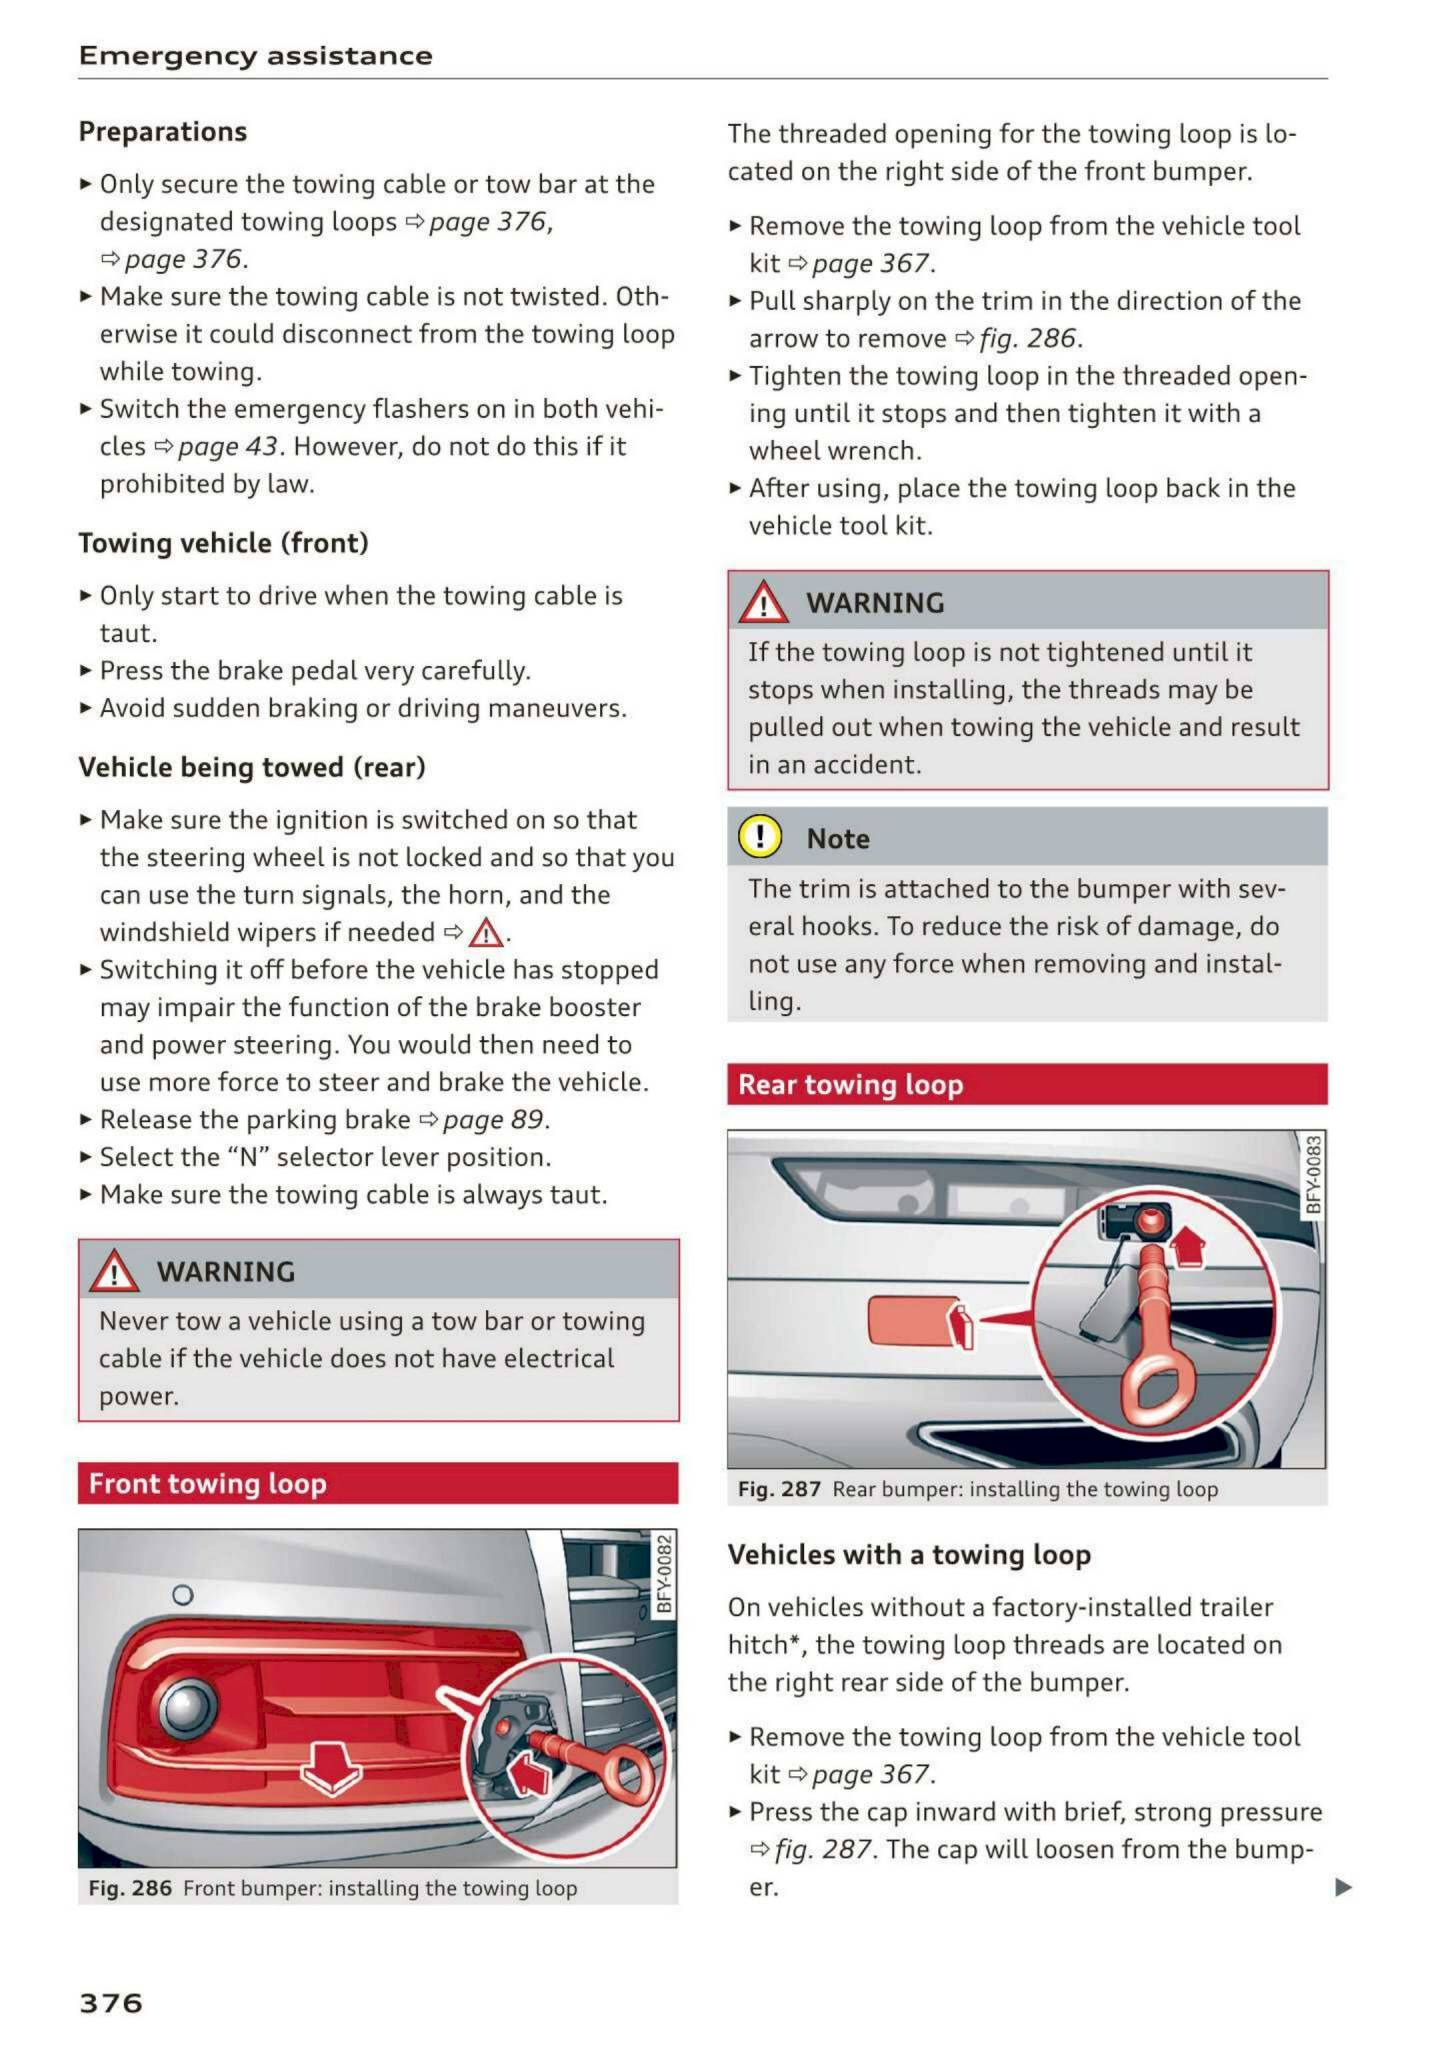 2020 Audi Q5 Sq5 Owner S Manual Page 378 Pdf